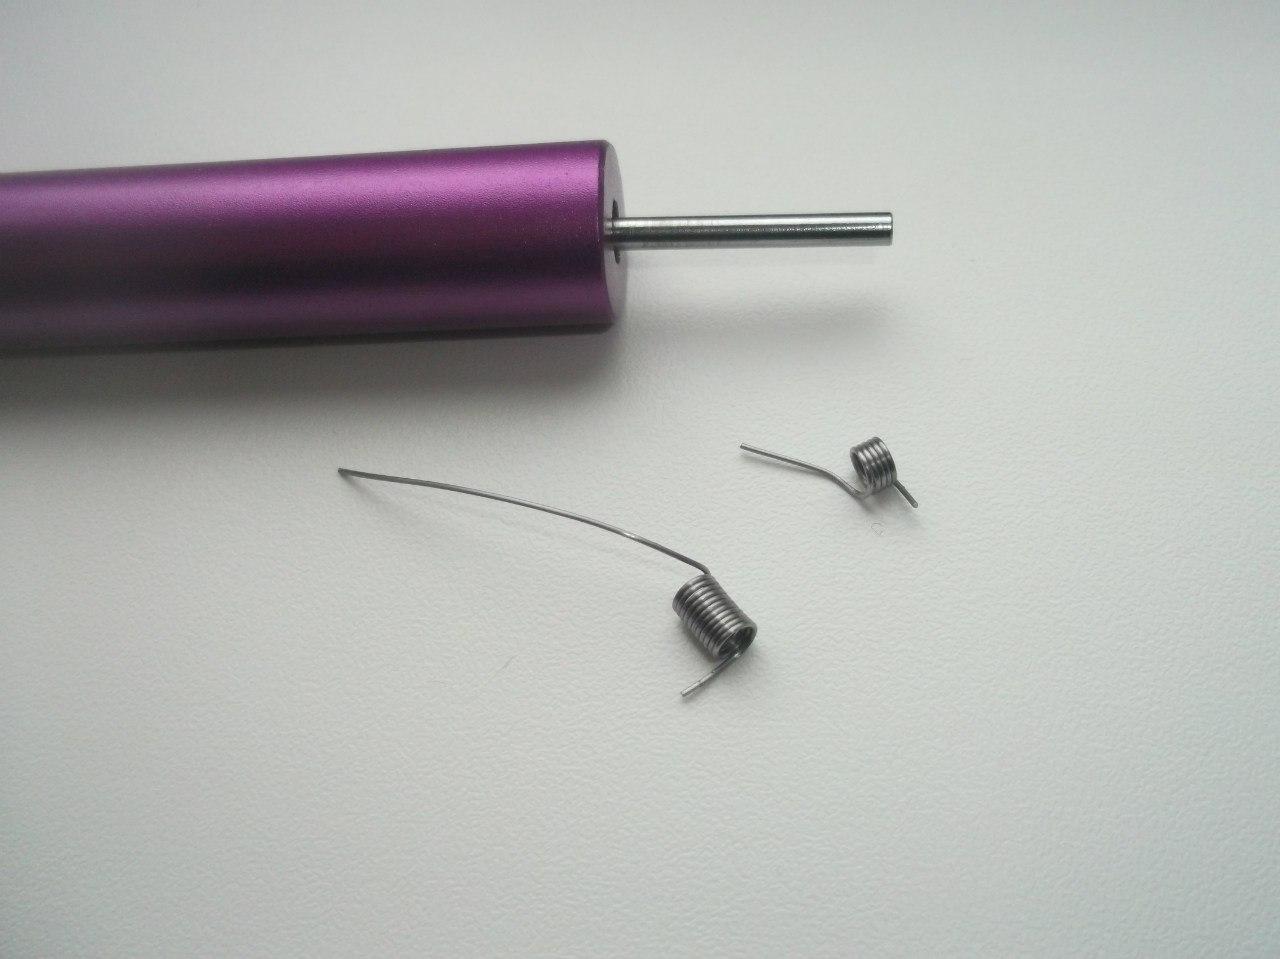 Universal Tools Wire Coiling Tool, он же kuro koiler. Приспособление для намотки спиралей.